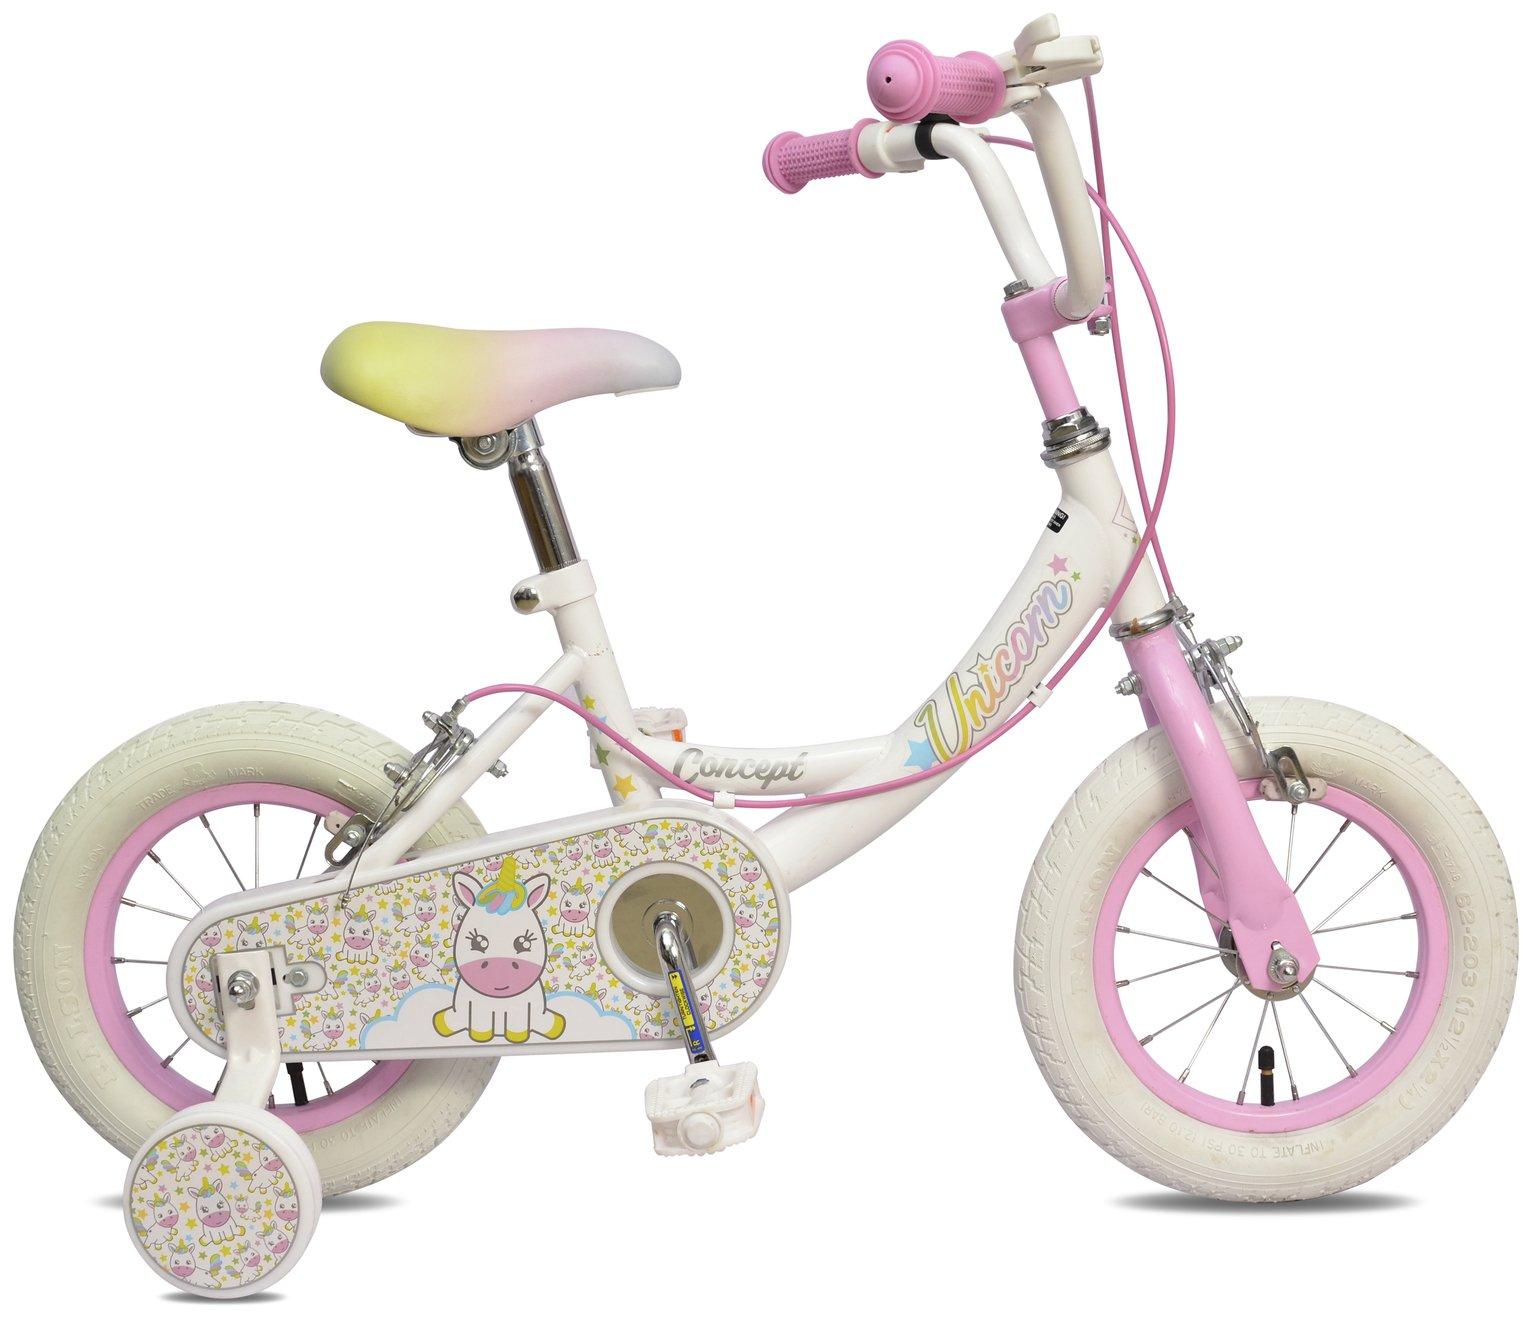 Image of Concept 12 Inch Kids Bike - Unicorn